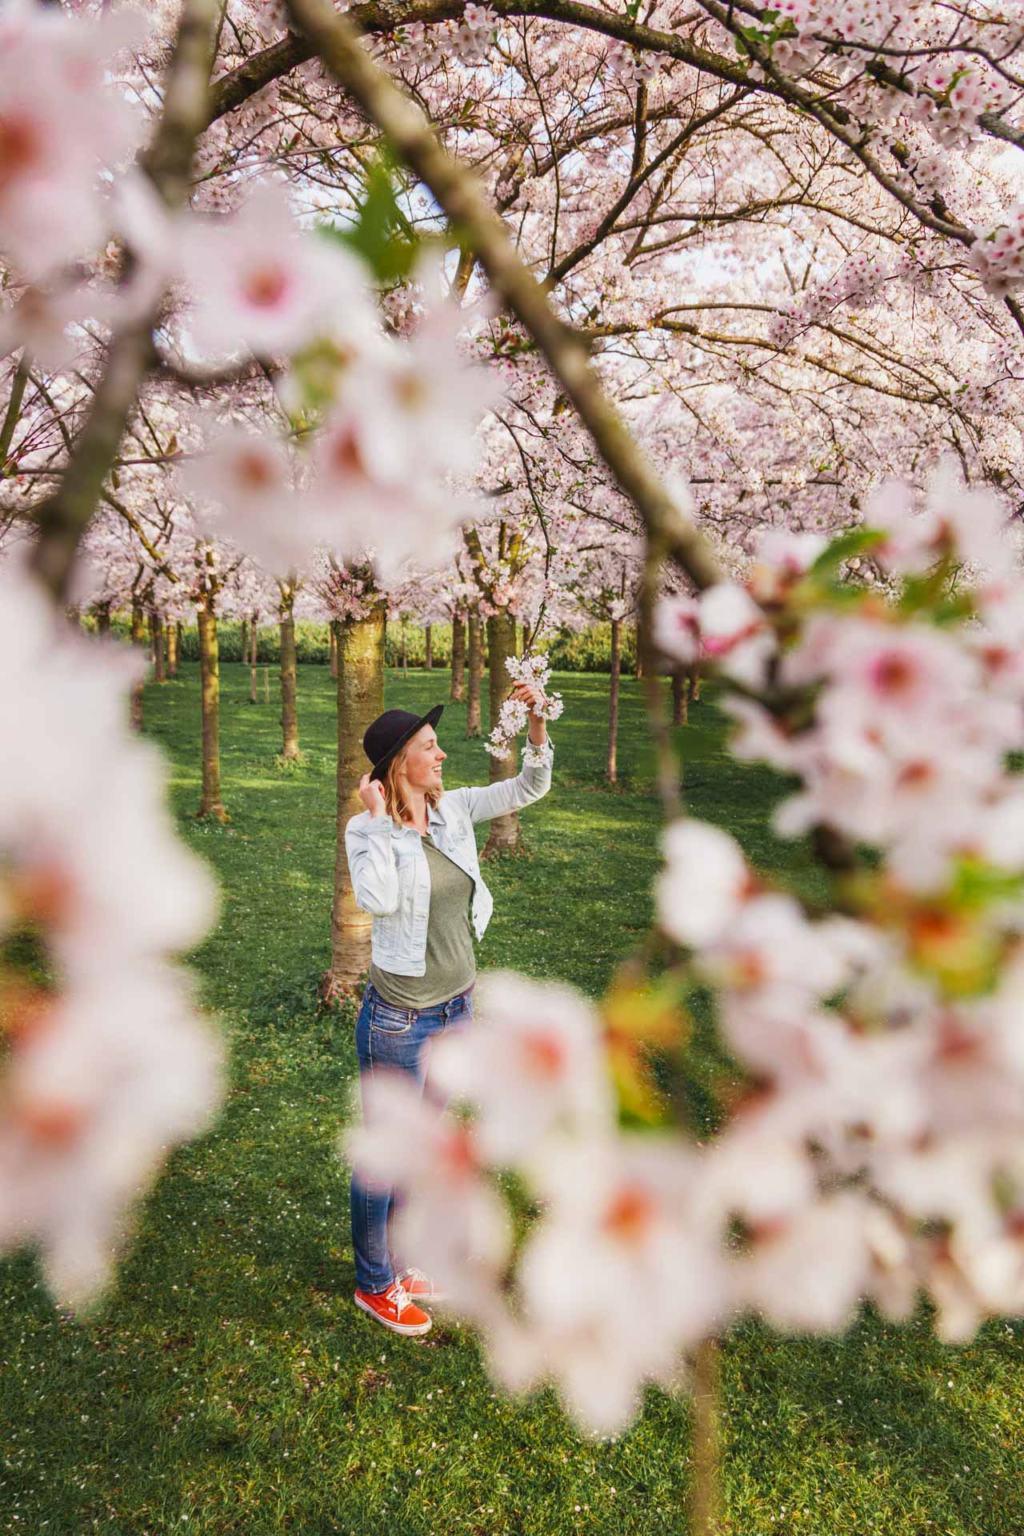 Sakura, Cherry Blossom, Amsterdamse Bos